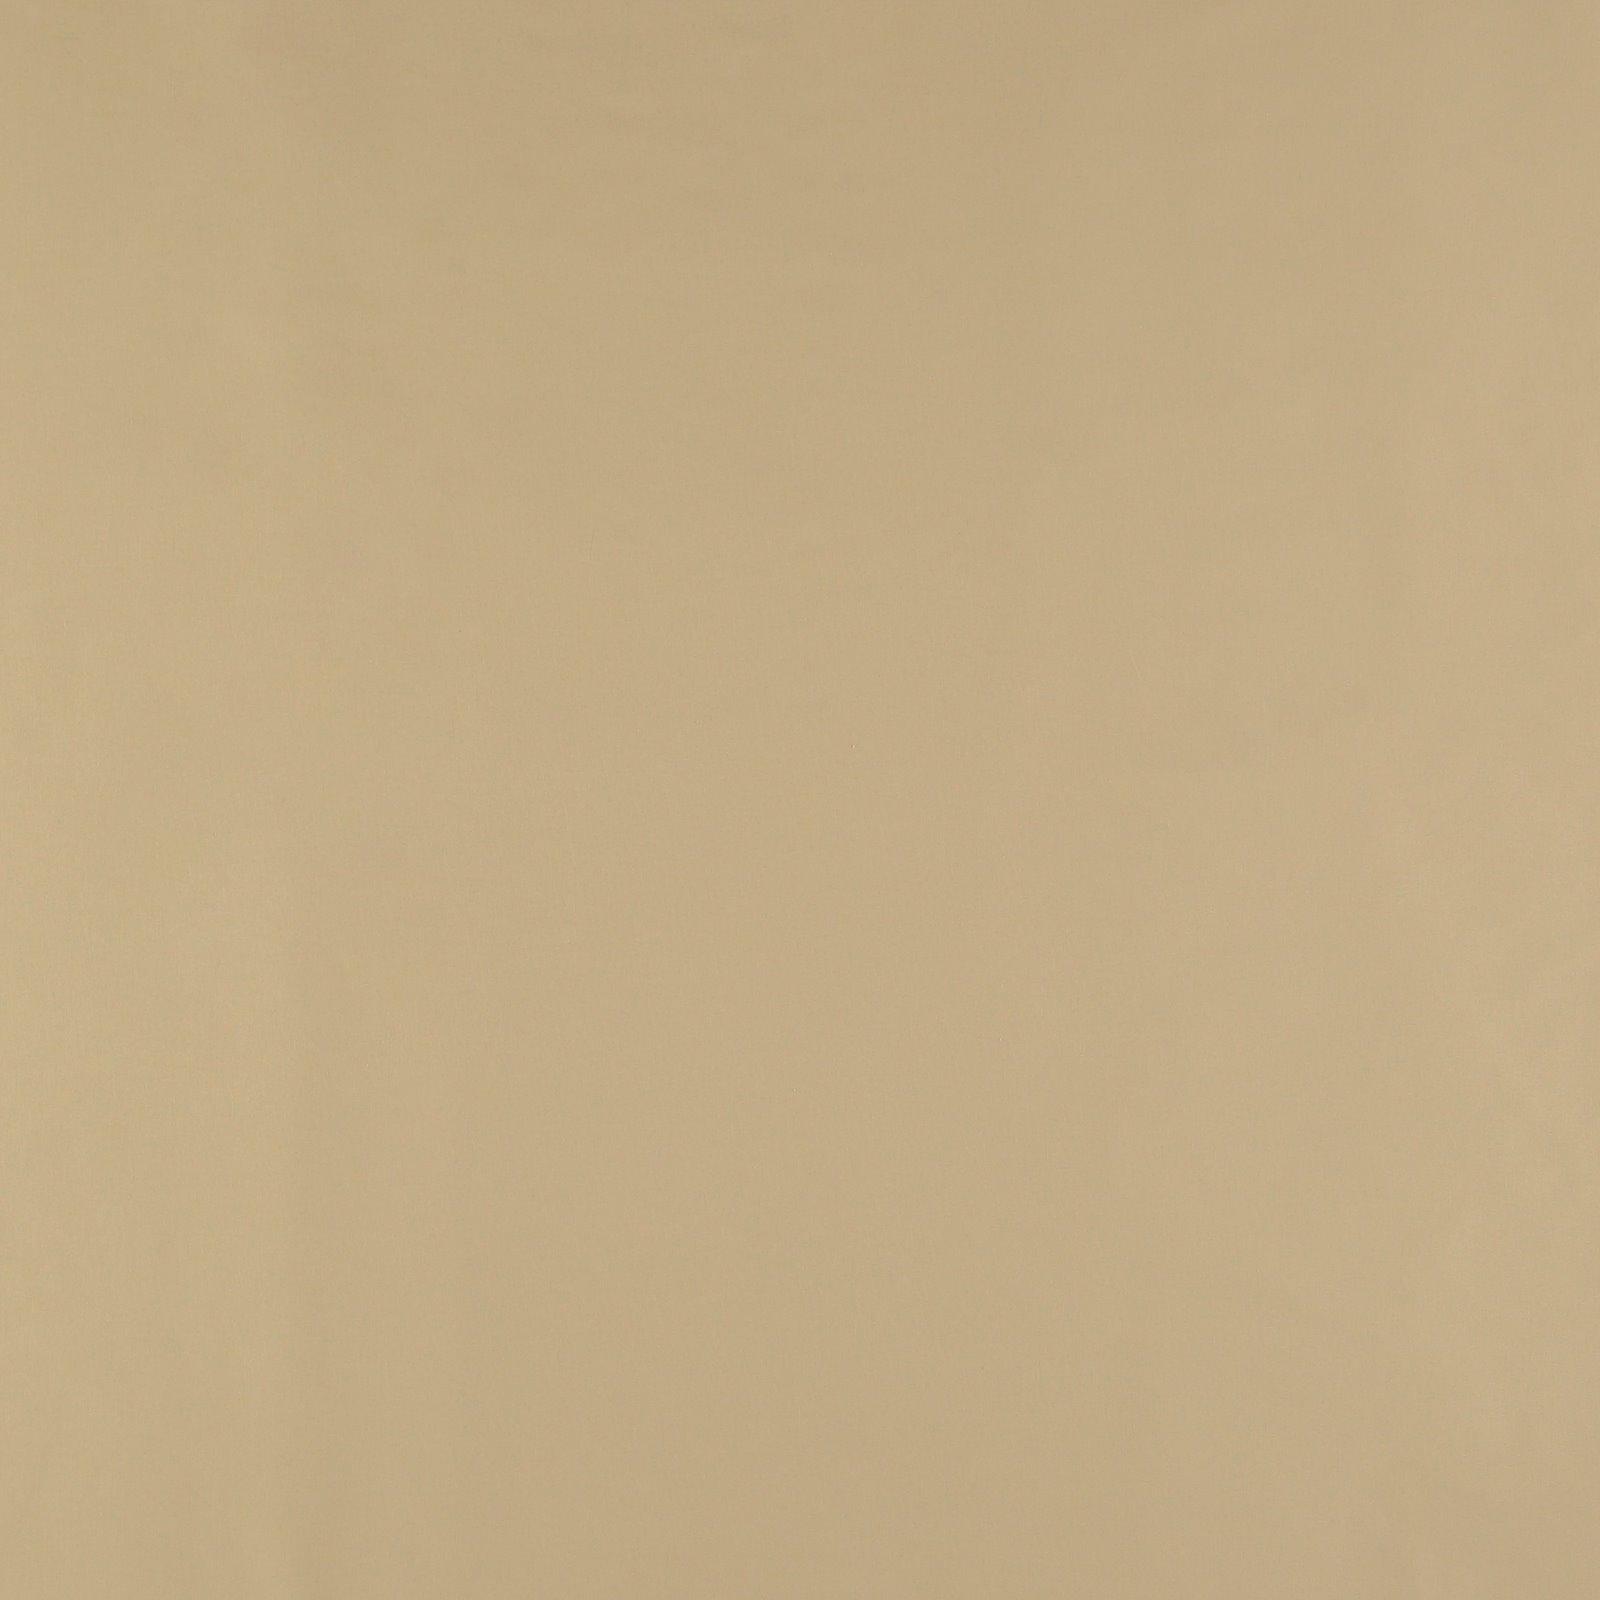 Organic cotton light beige 780507_pack_solid